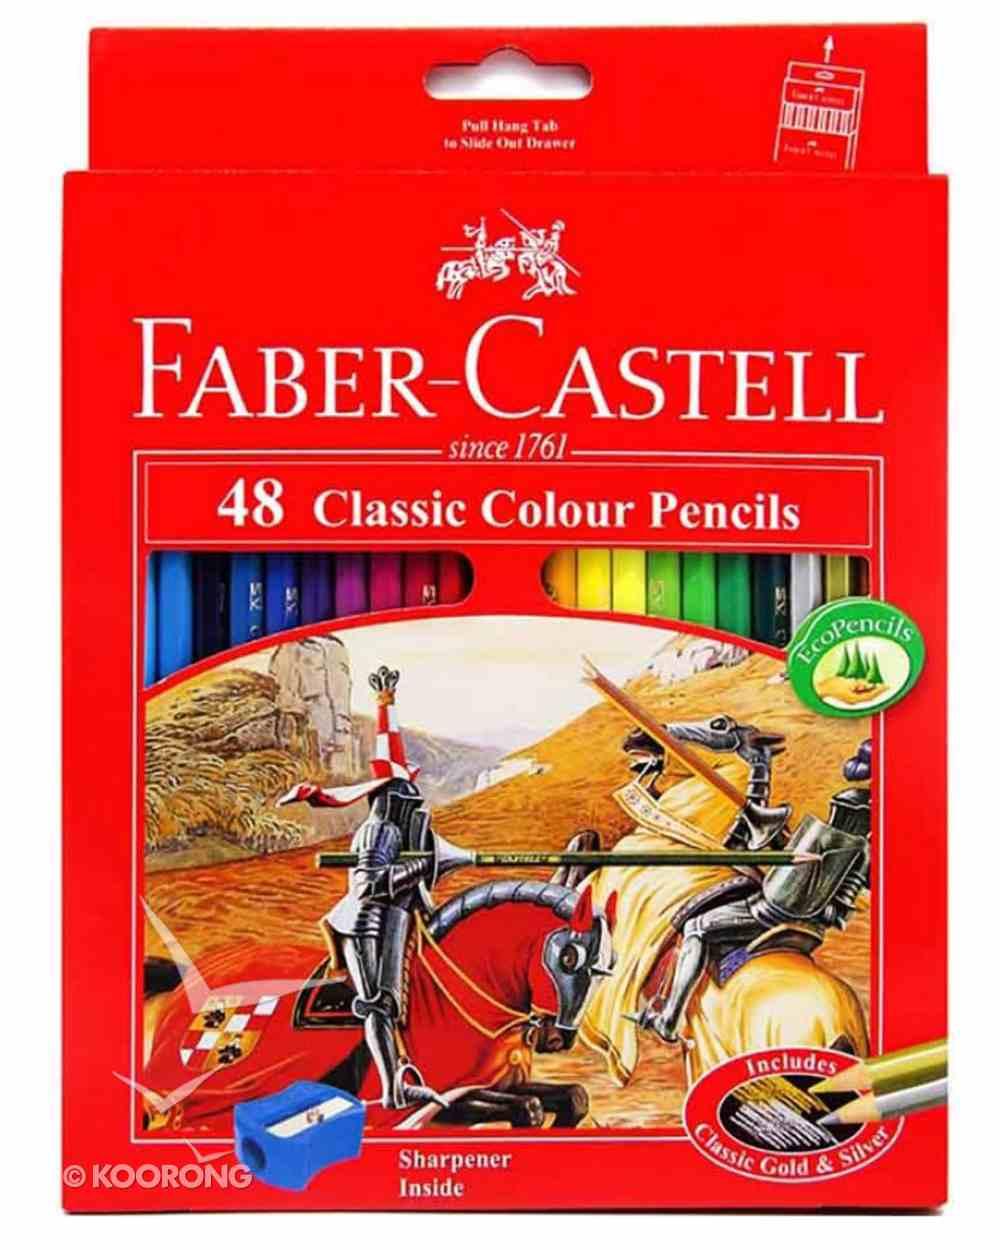 Faber-Castell Classic Colour Pencils Set of 48 + Bonus Sharpener Stationery